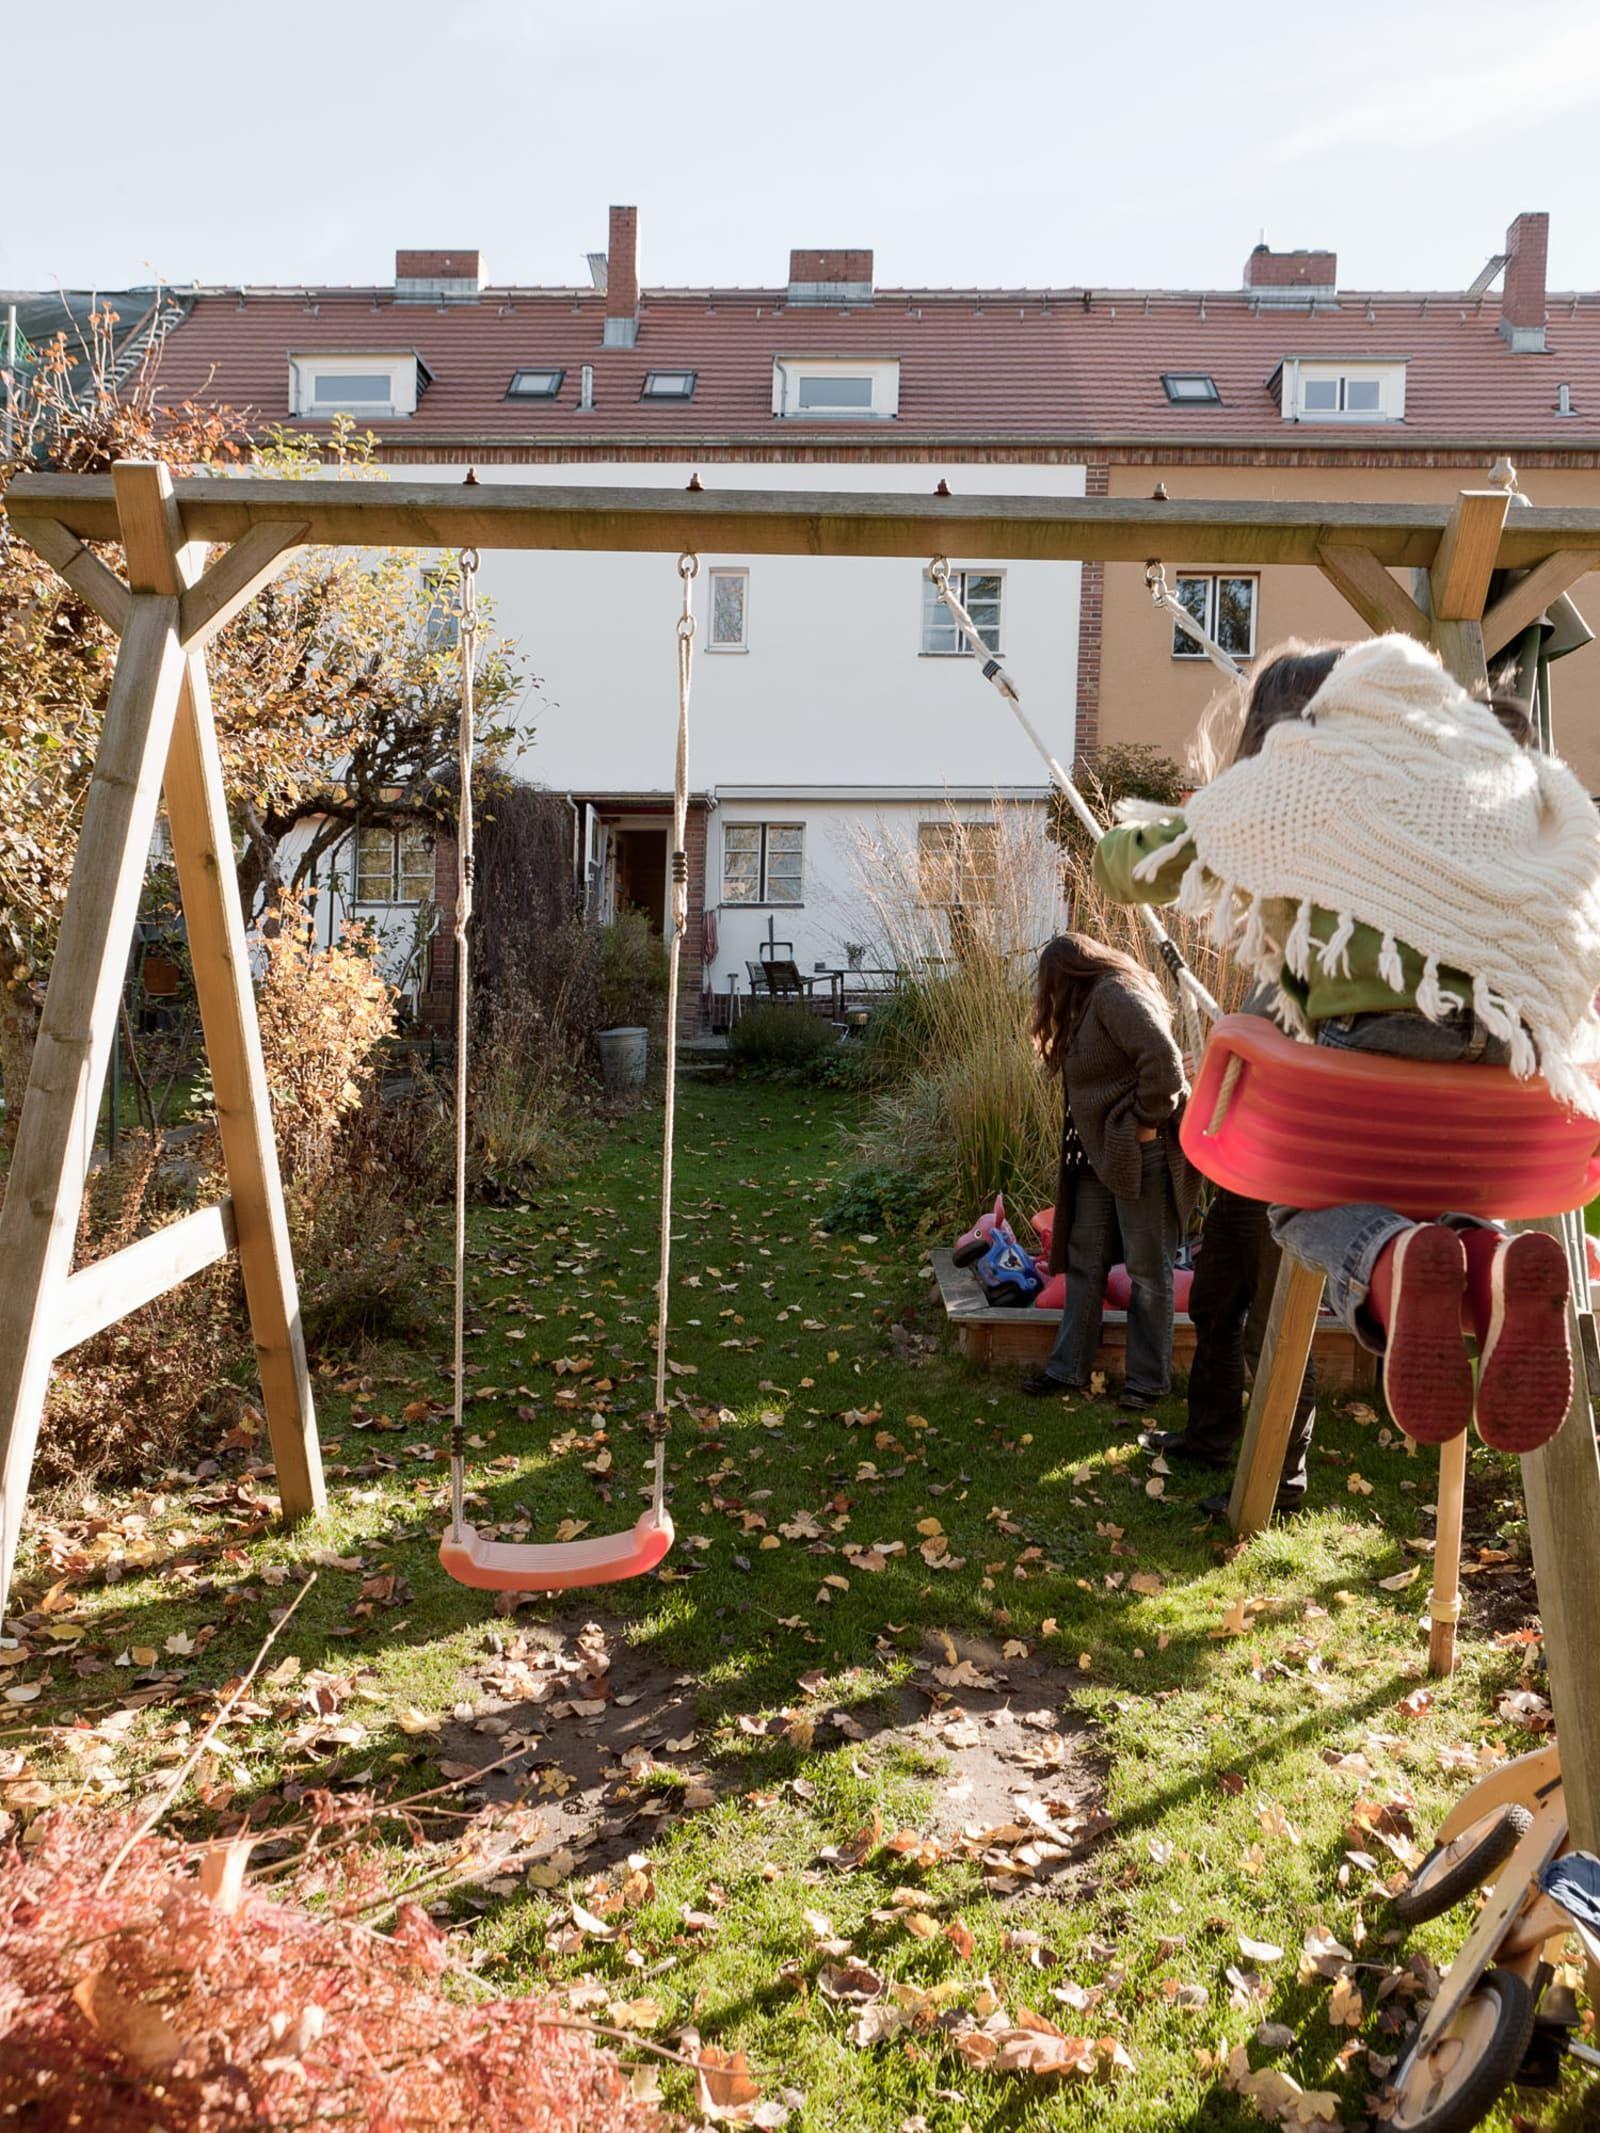 Bruno Taut Martin Wagner hiepler brunier · The Hufeisensiedlung